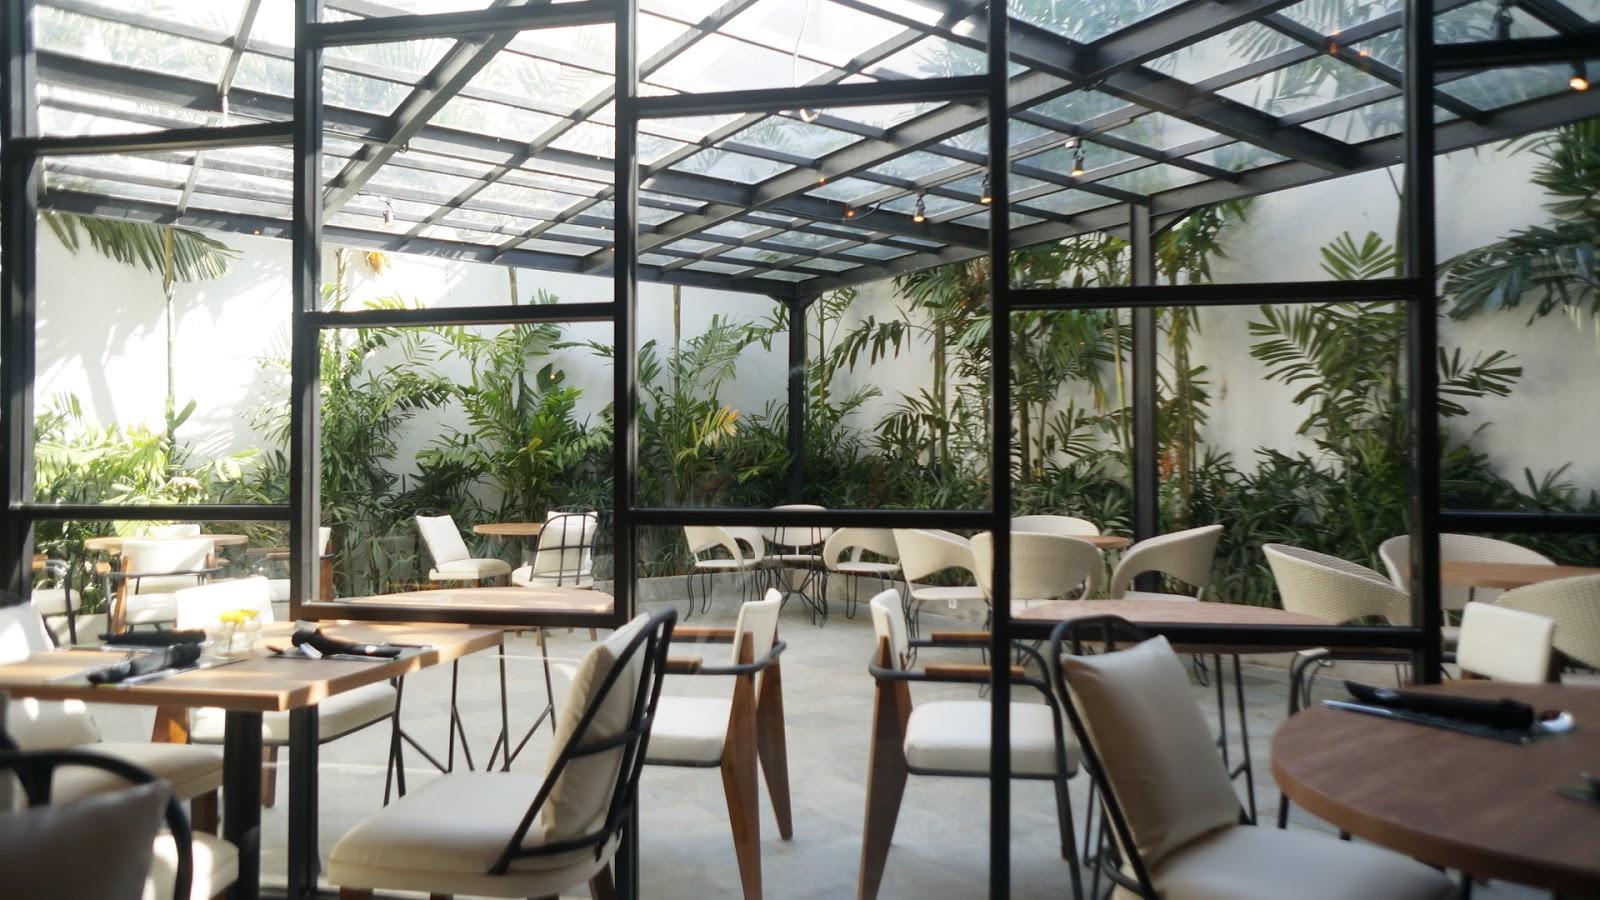 Cafe Noah noach cafe bistro surabaya review angelia s